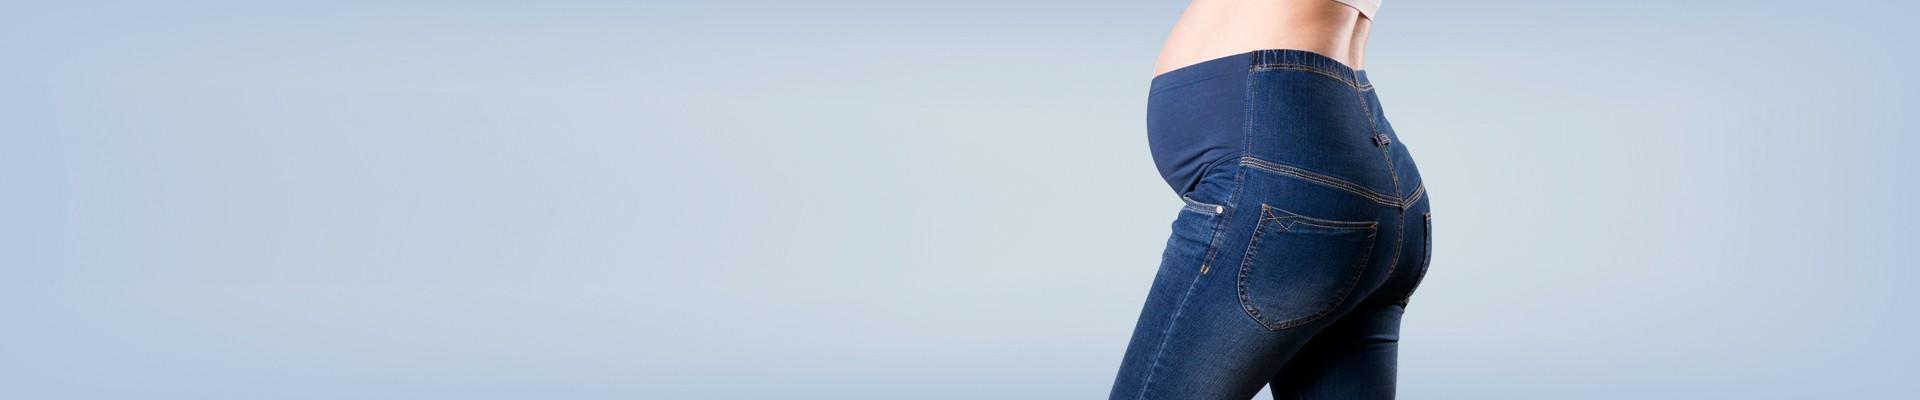 Jual Celana Ibu Hamil - Harga Grosir Online